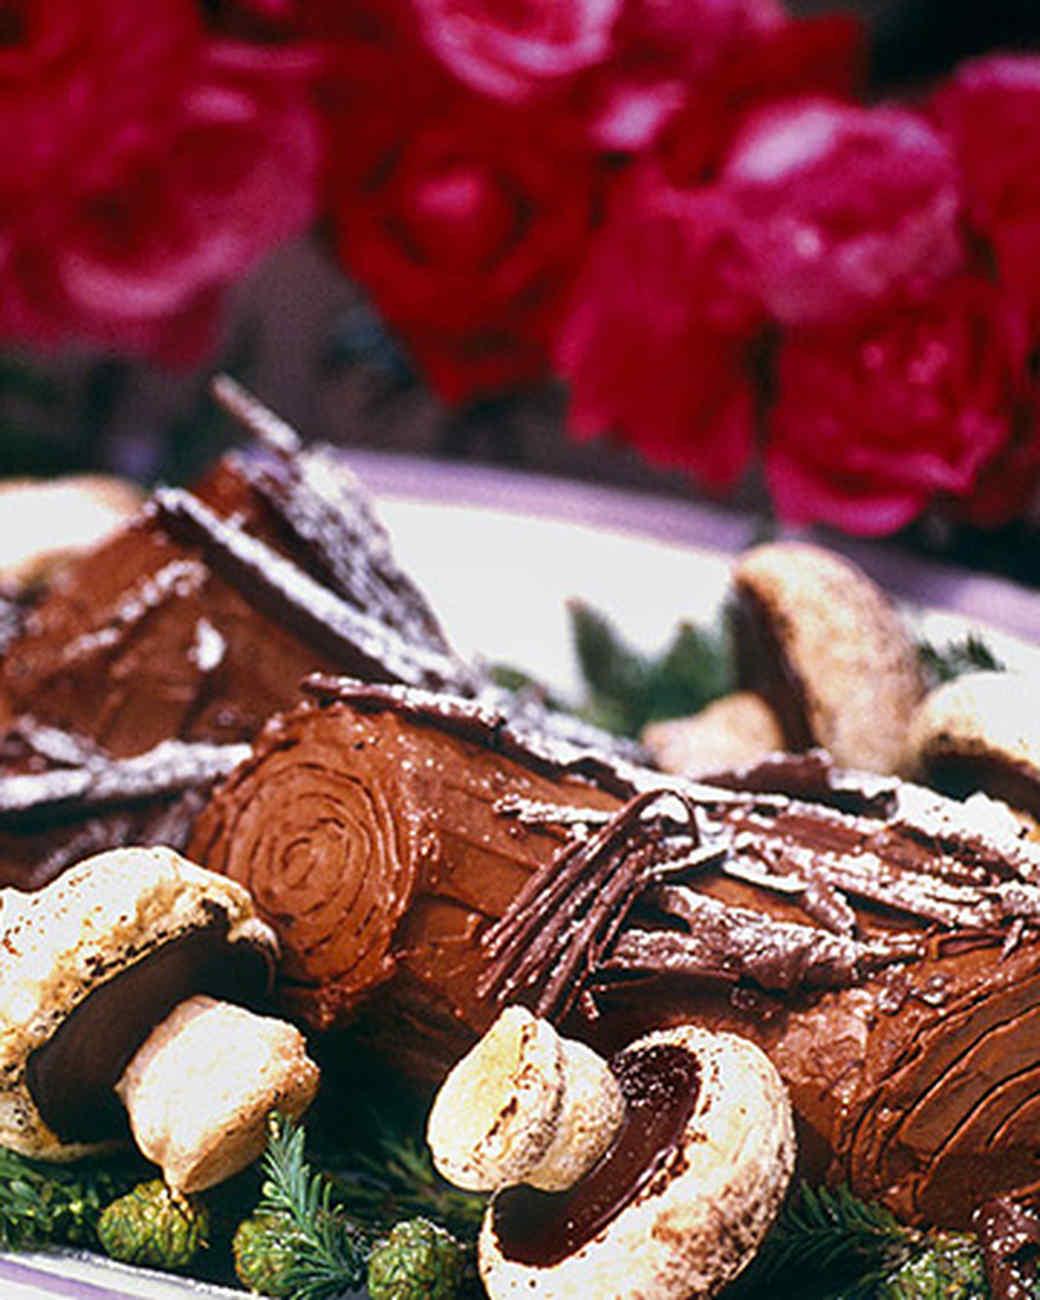 cakes_01296_t.jpg